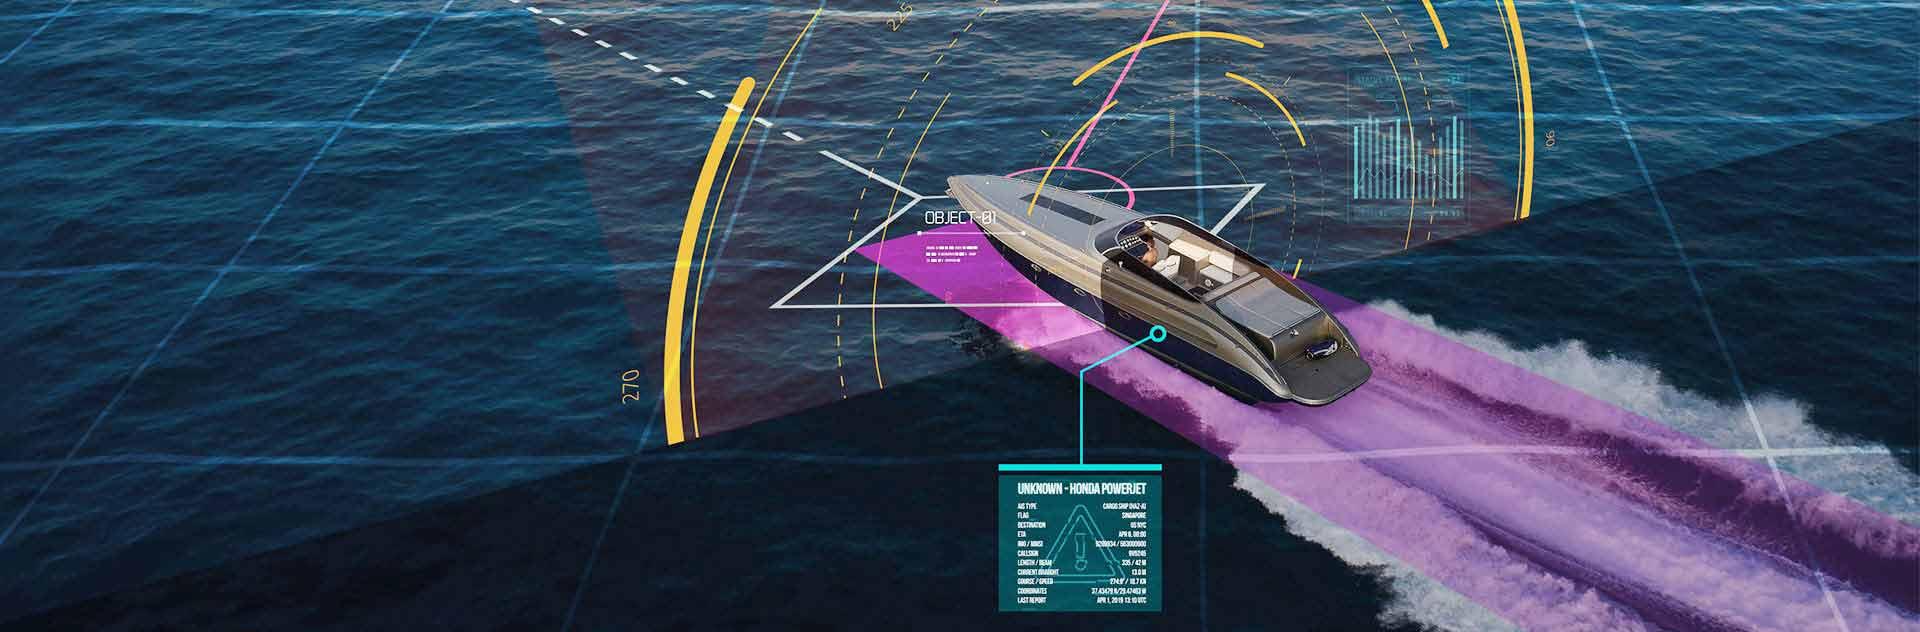 Coastal surveillance systems